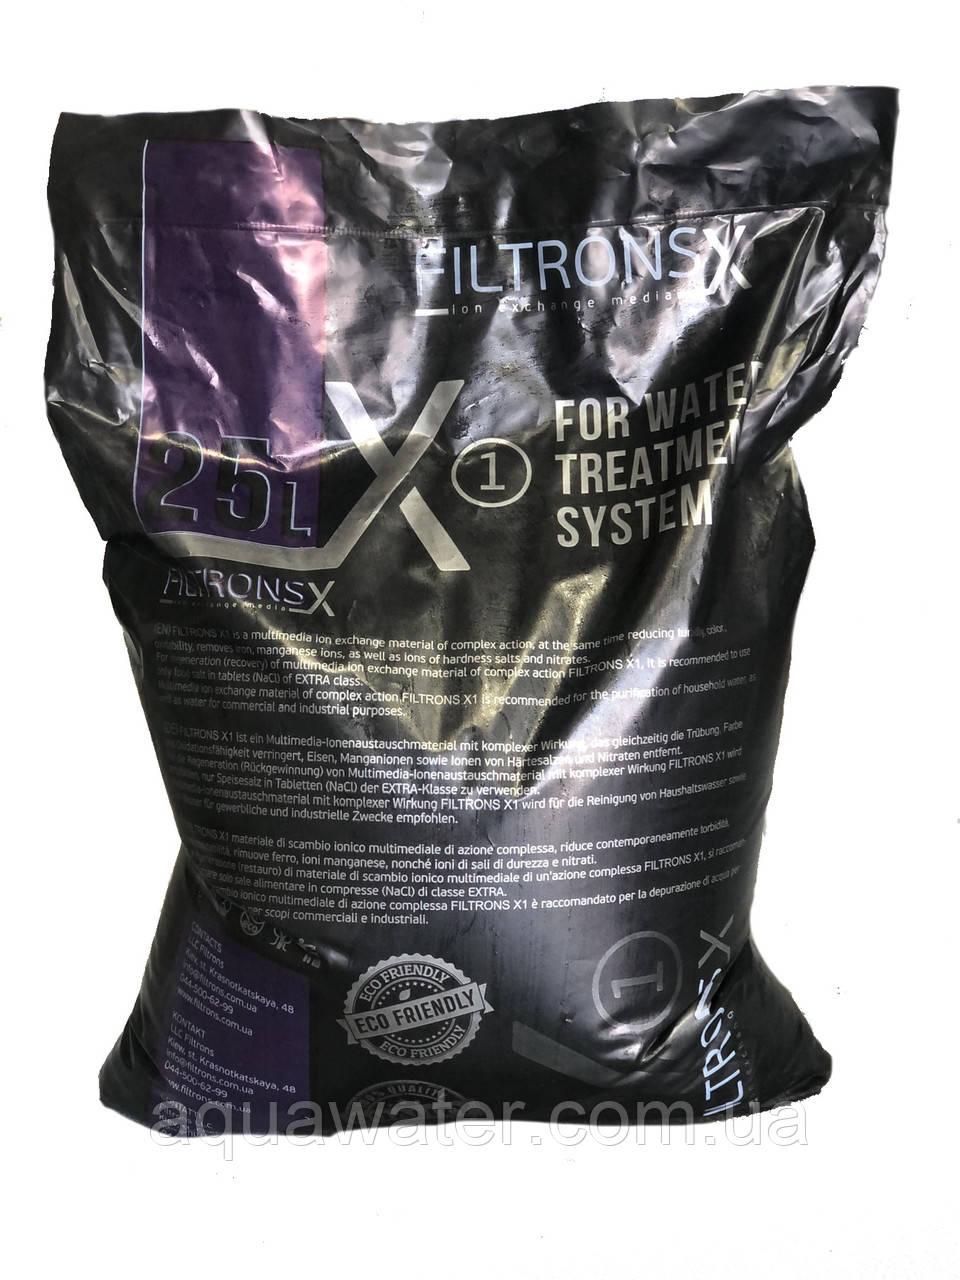 FILTRONS X1 - фильтрующий материал комплексного действия 25 л (аналог Ecomix A) по нитратах